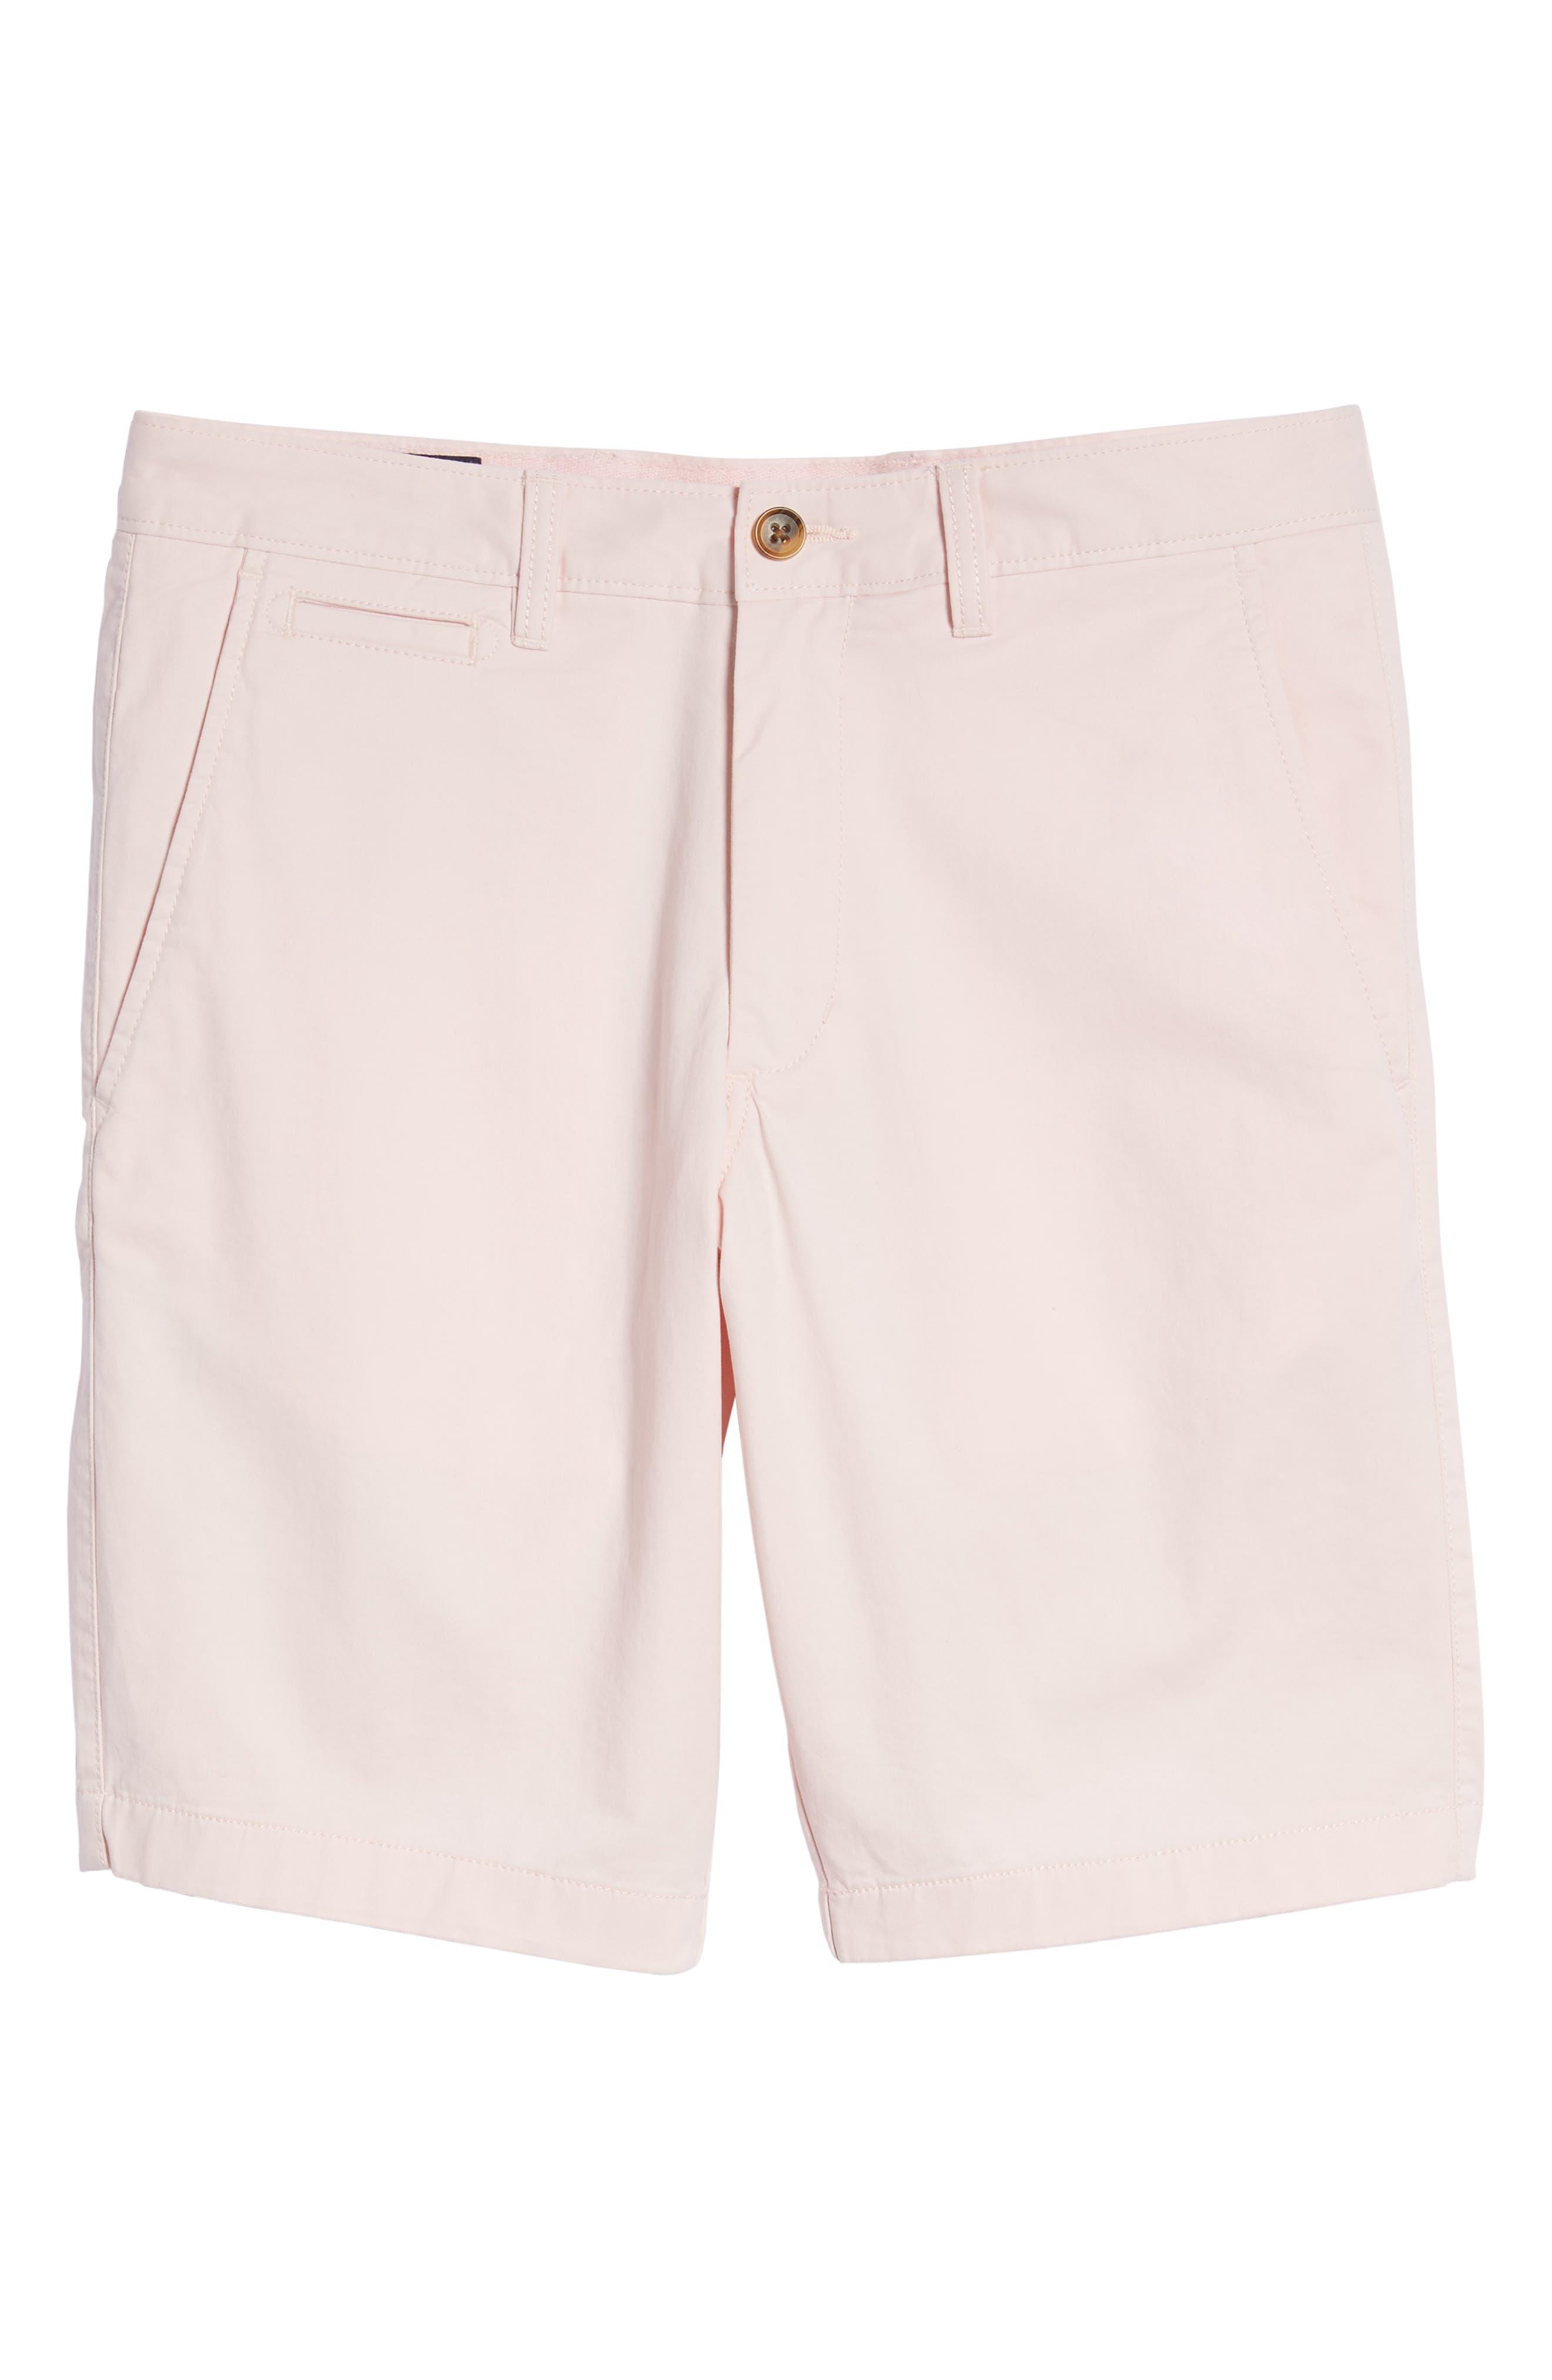 Ballard Slim Fit Stretch Chino 11-Inch Shorts,                             Alternate thumbnail 87, color,